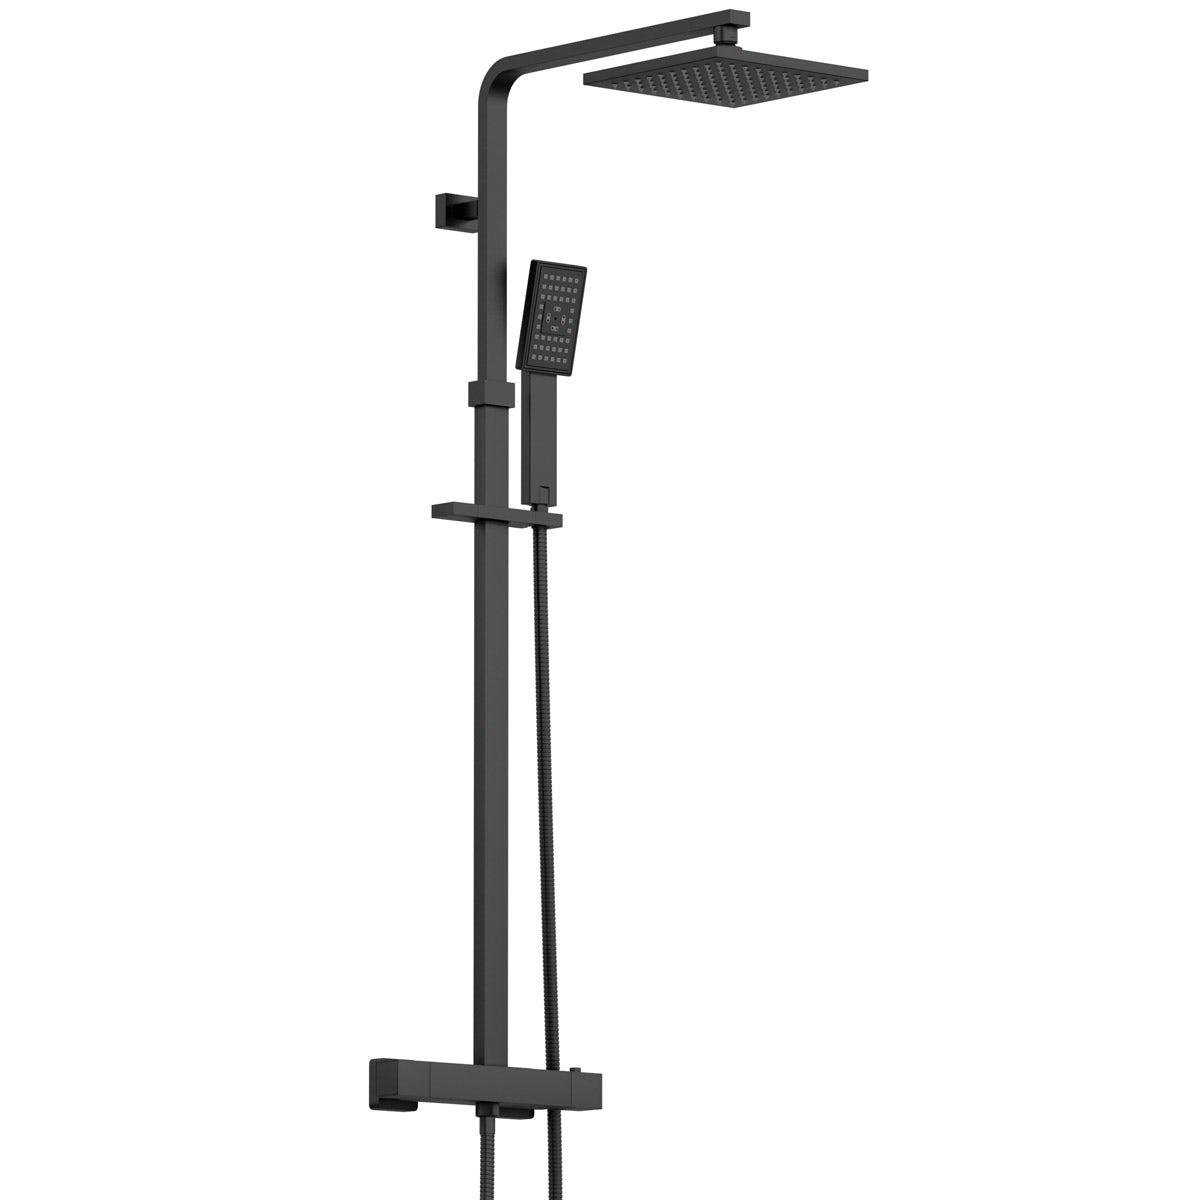 Orchard Wye black thermostatic bar valve shower system